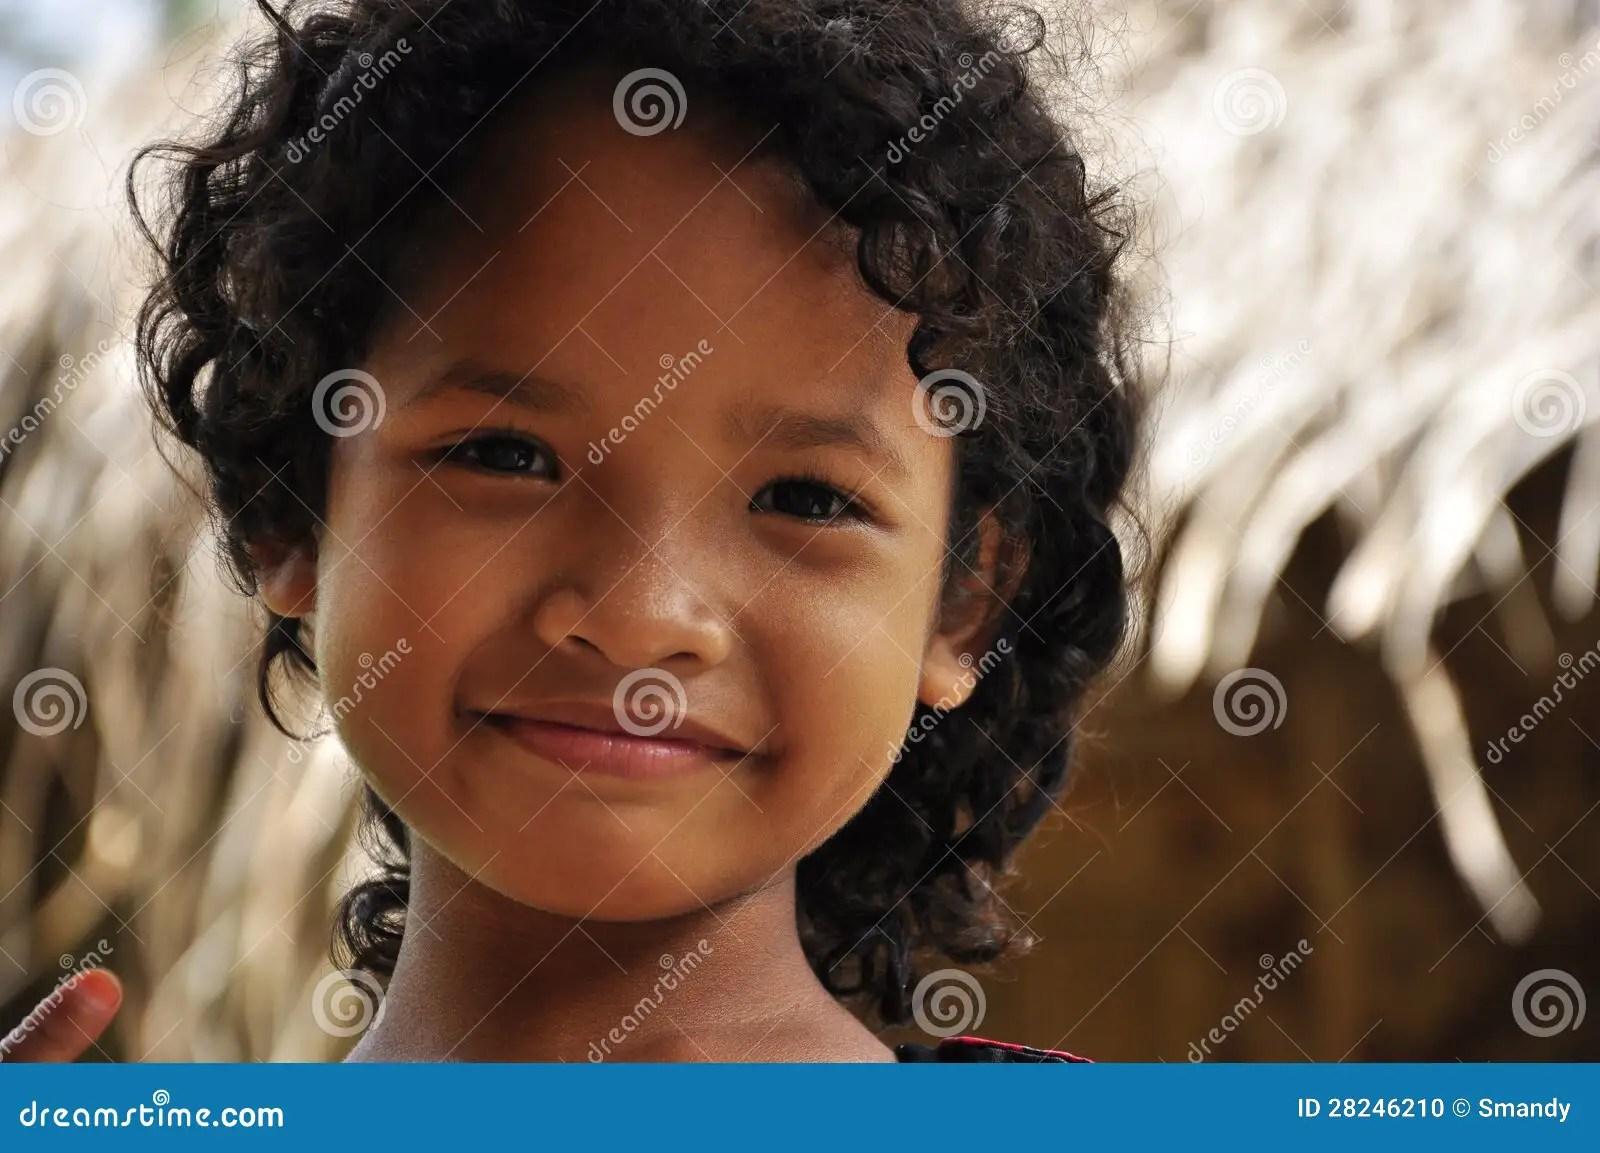 Malaysian Indigenous Girl Smiling Serene Editorial Image - Image: 28246210